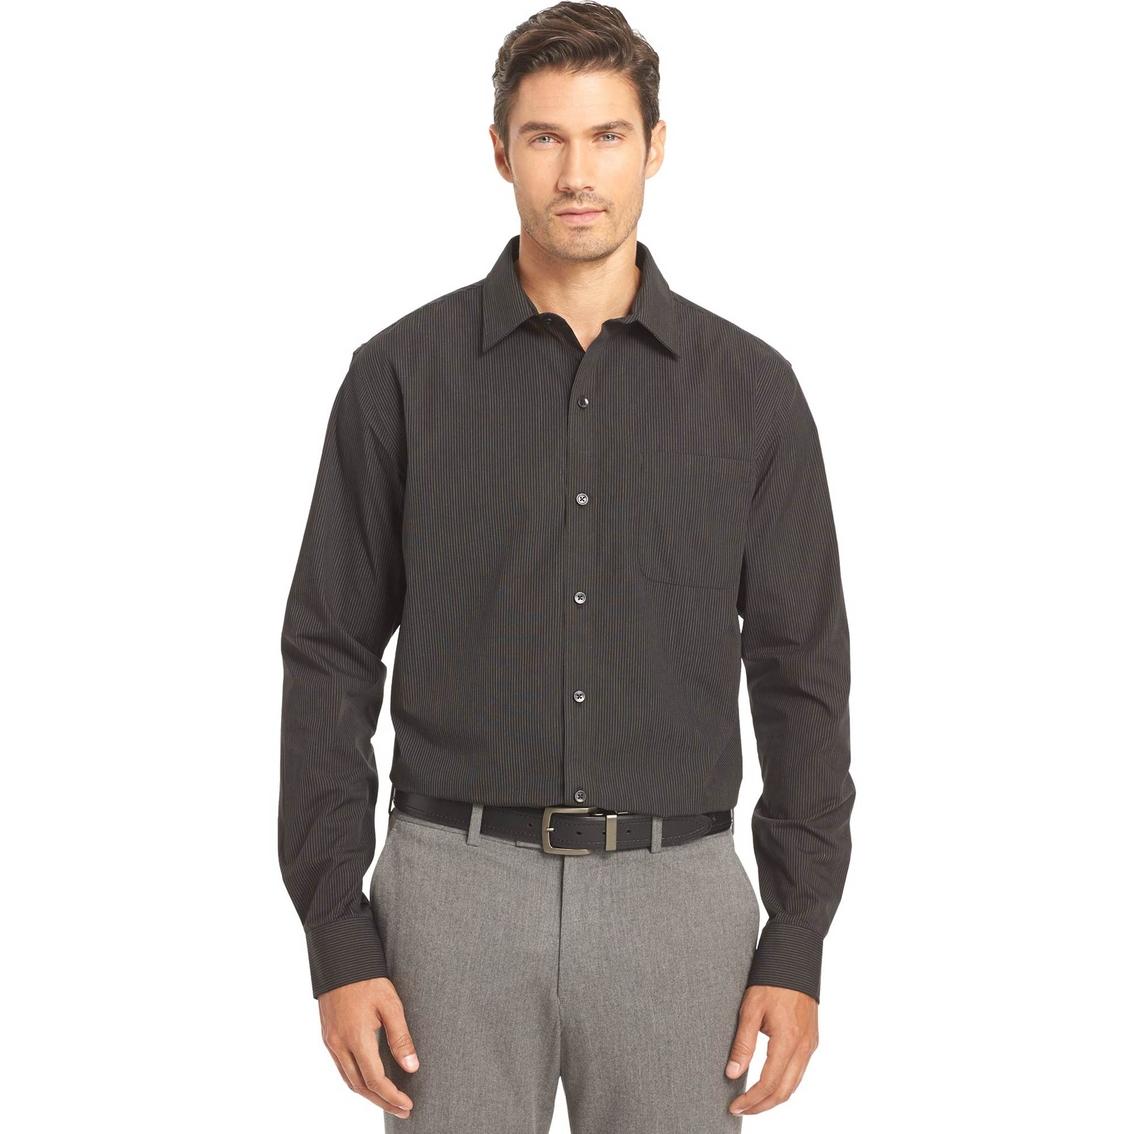 Van Heusen Sportswear No Iron Traveler Shirt Casual